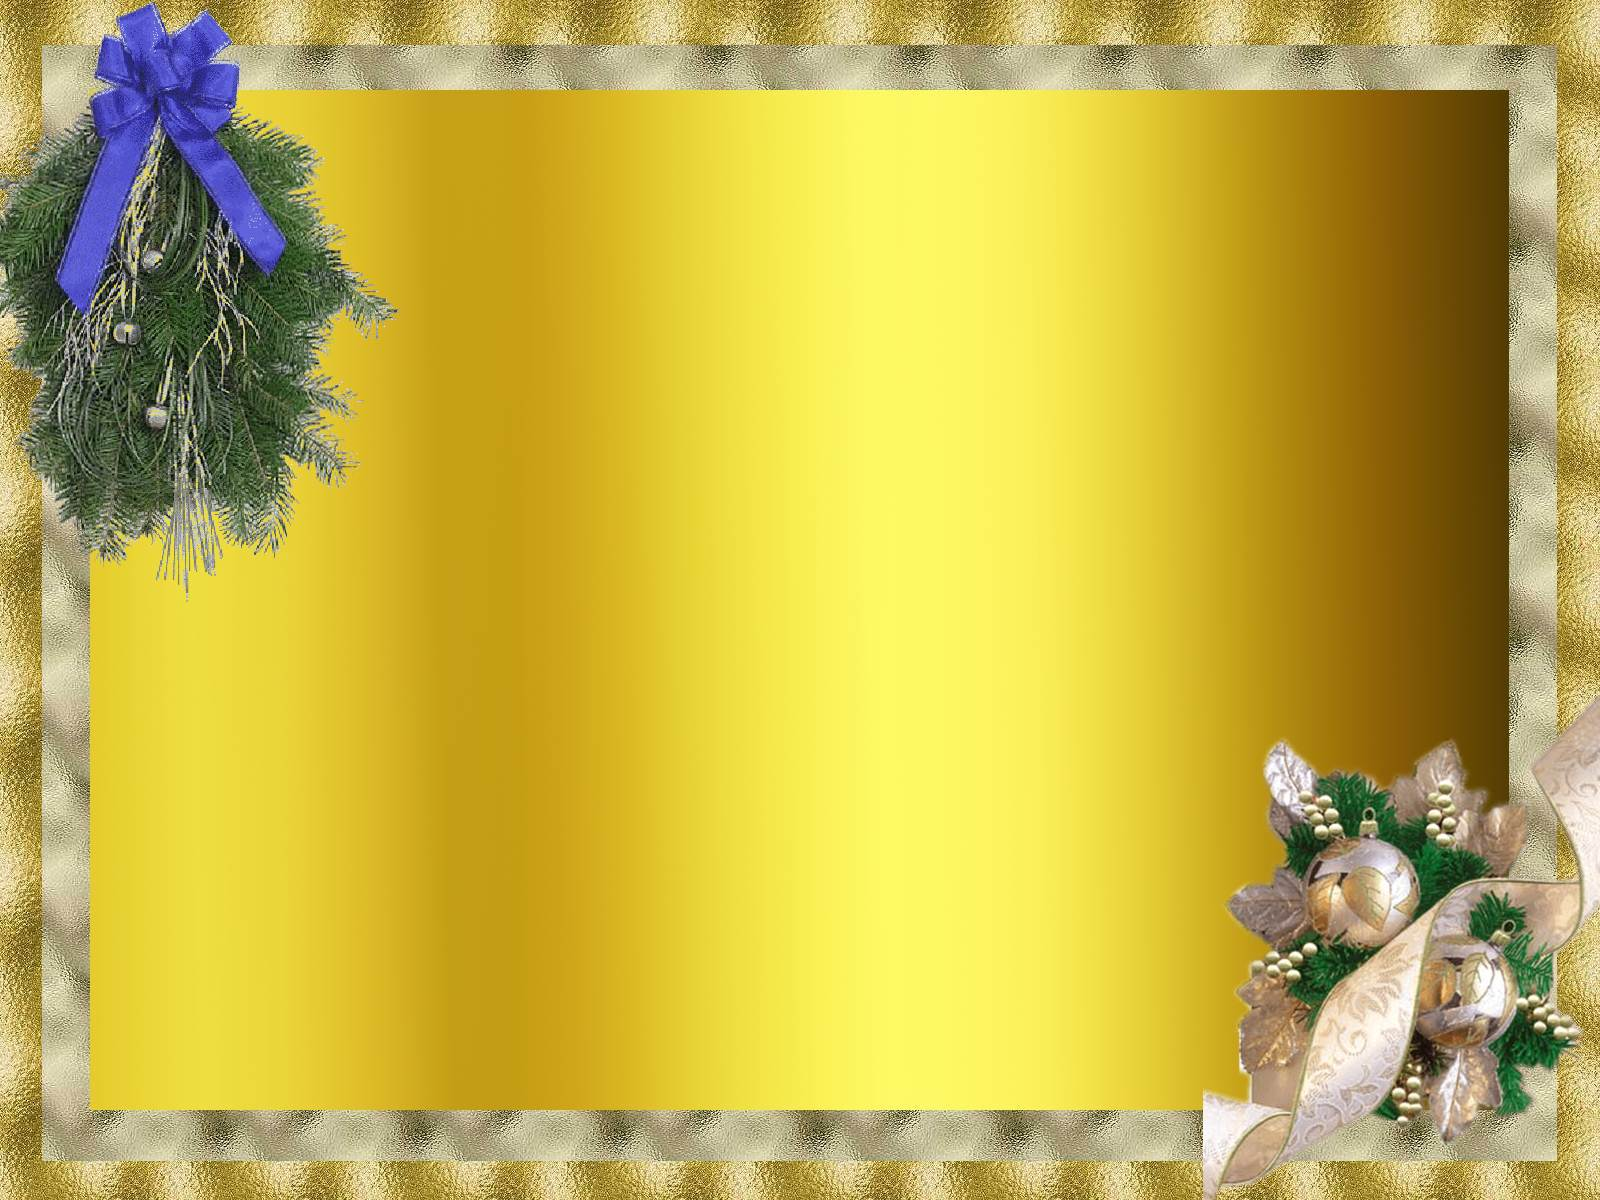 Iphone 8 Wallpaper Hd Fondos Para Hacer Tus Wallpapers De Navidad Christmas